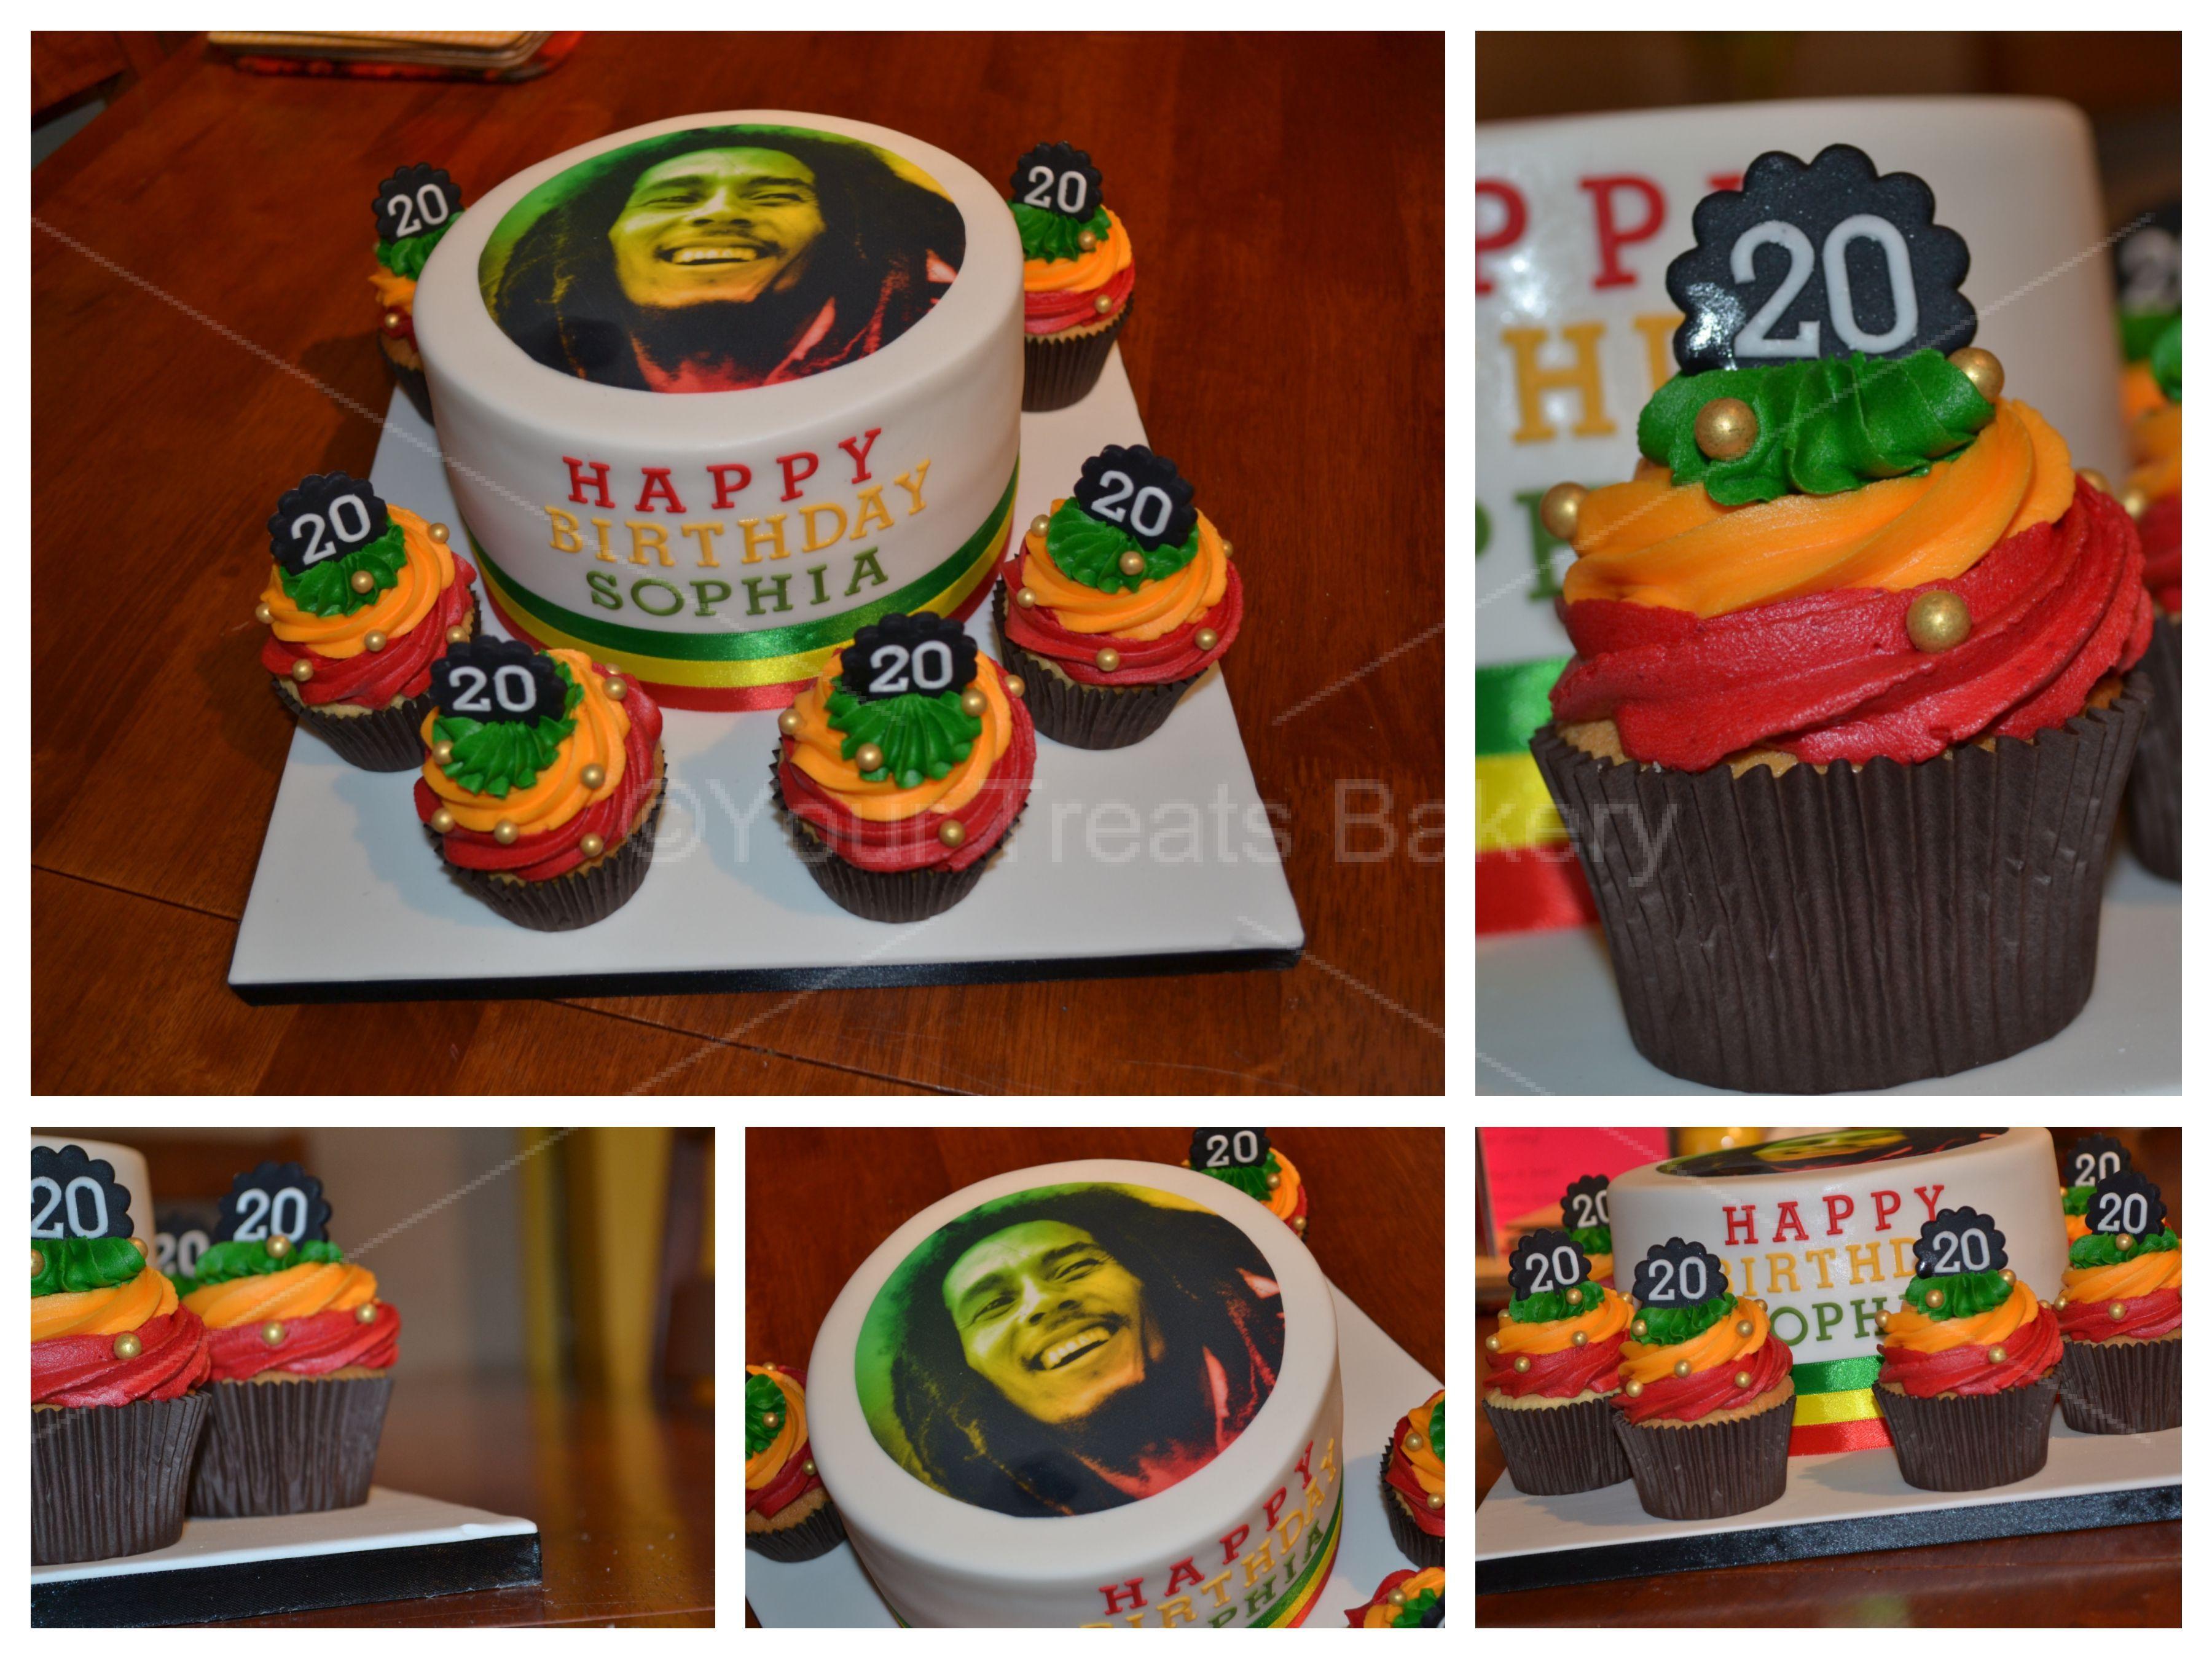 Phenomenal Bob Marley Cake Your Treats Bakery Funny Birthday Cards Online Elaedamsfinfo